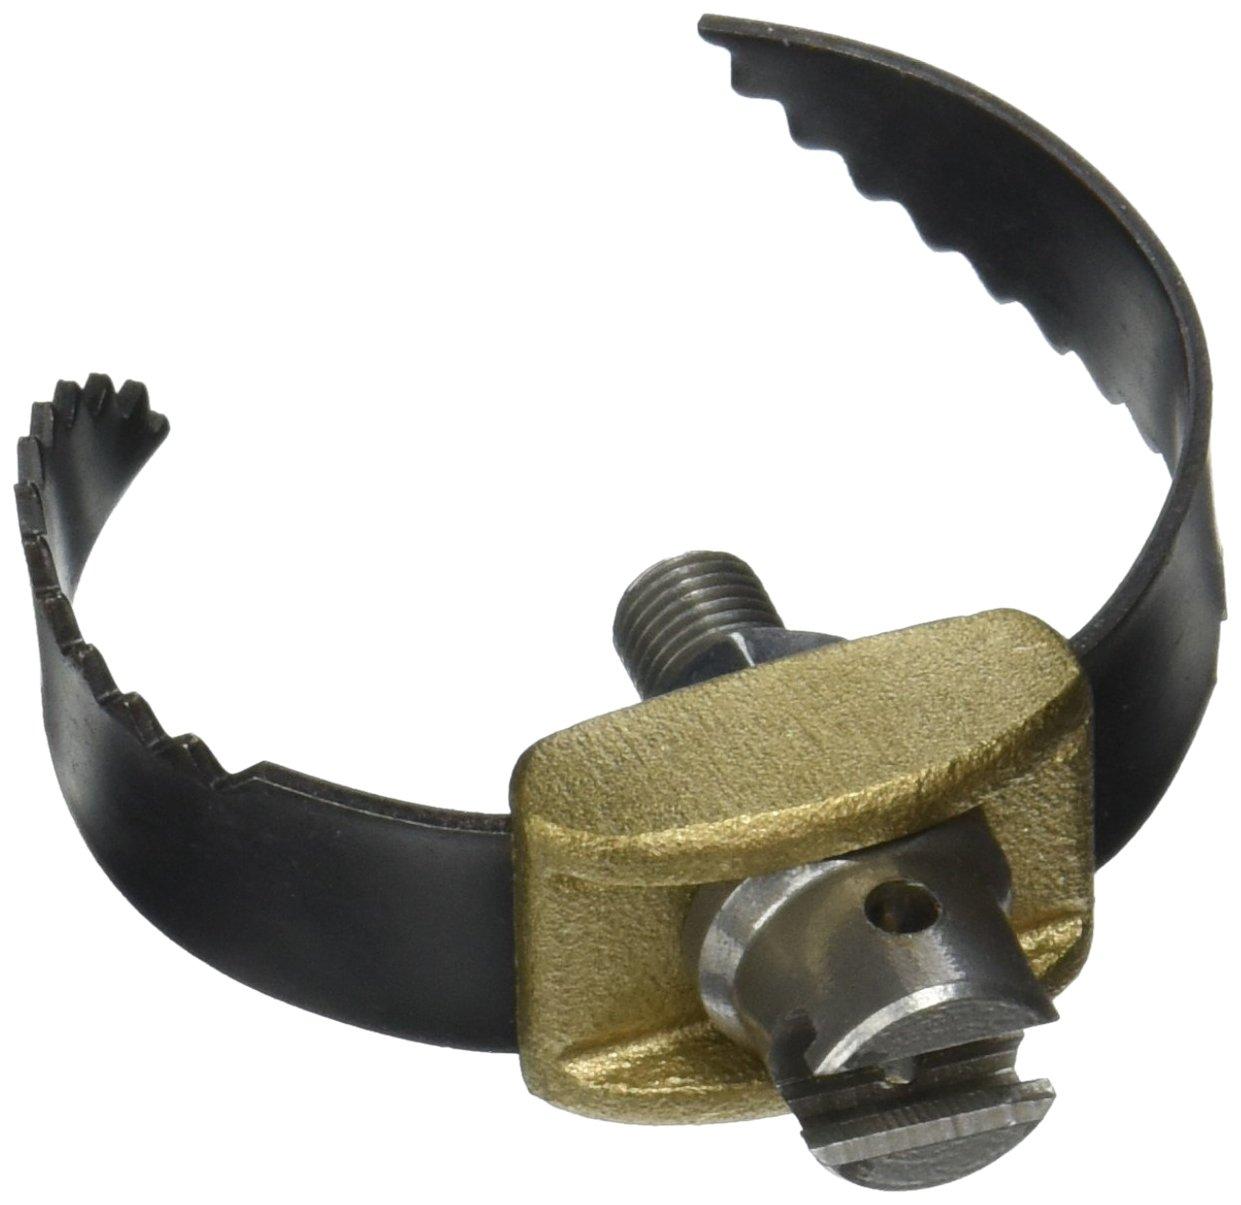 Ridgid 52817 Drain Cleaner Tools - T-231 2-1/2'' Heavy Duty